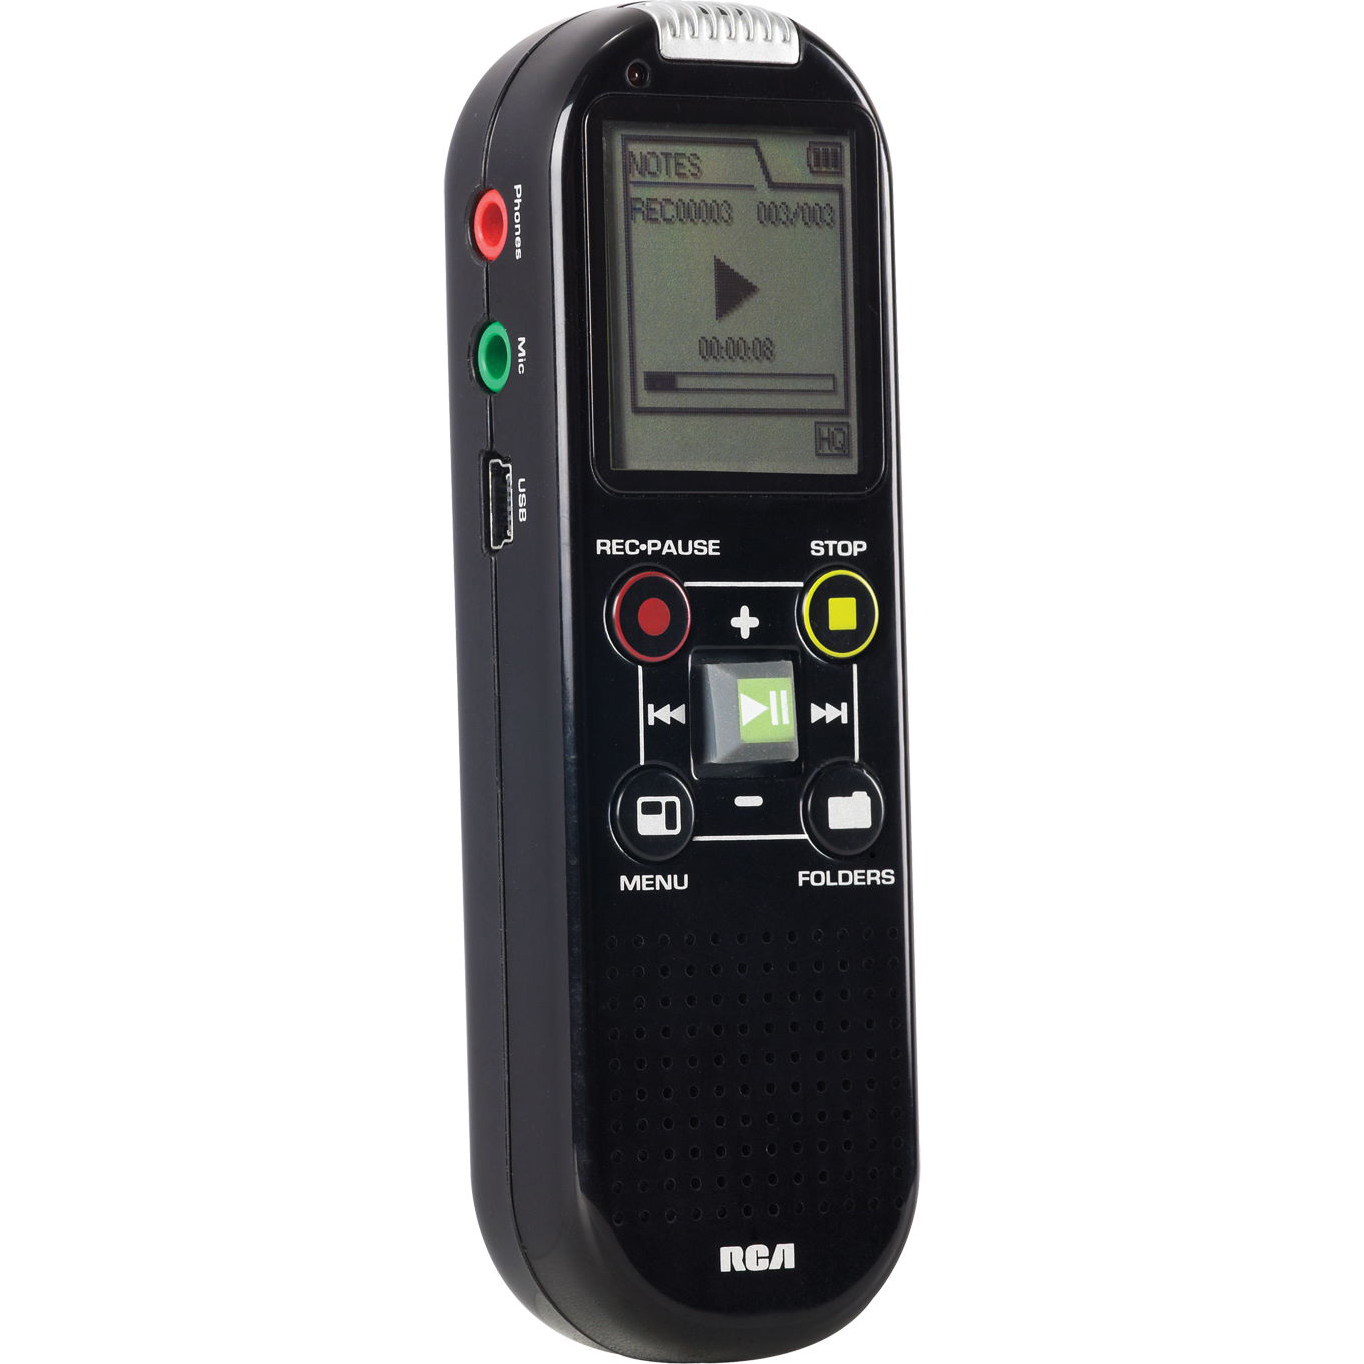 Rca Vr6320 Digital Voice Recorder 2gb